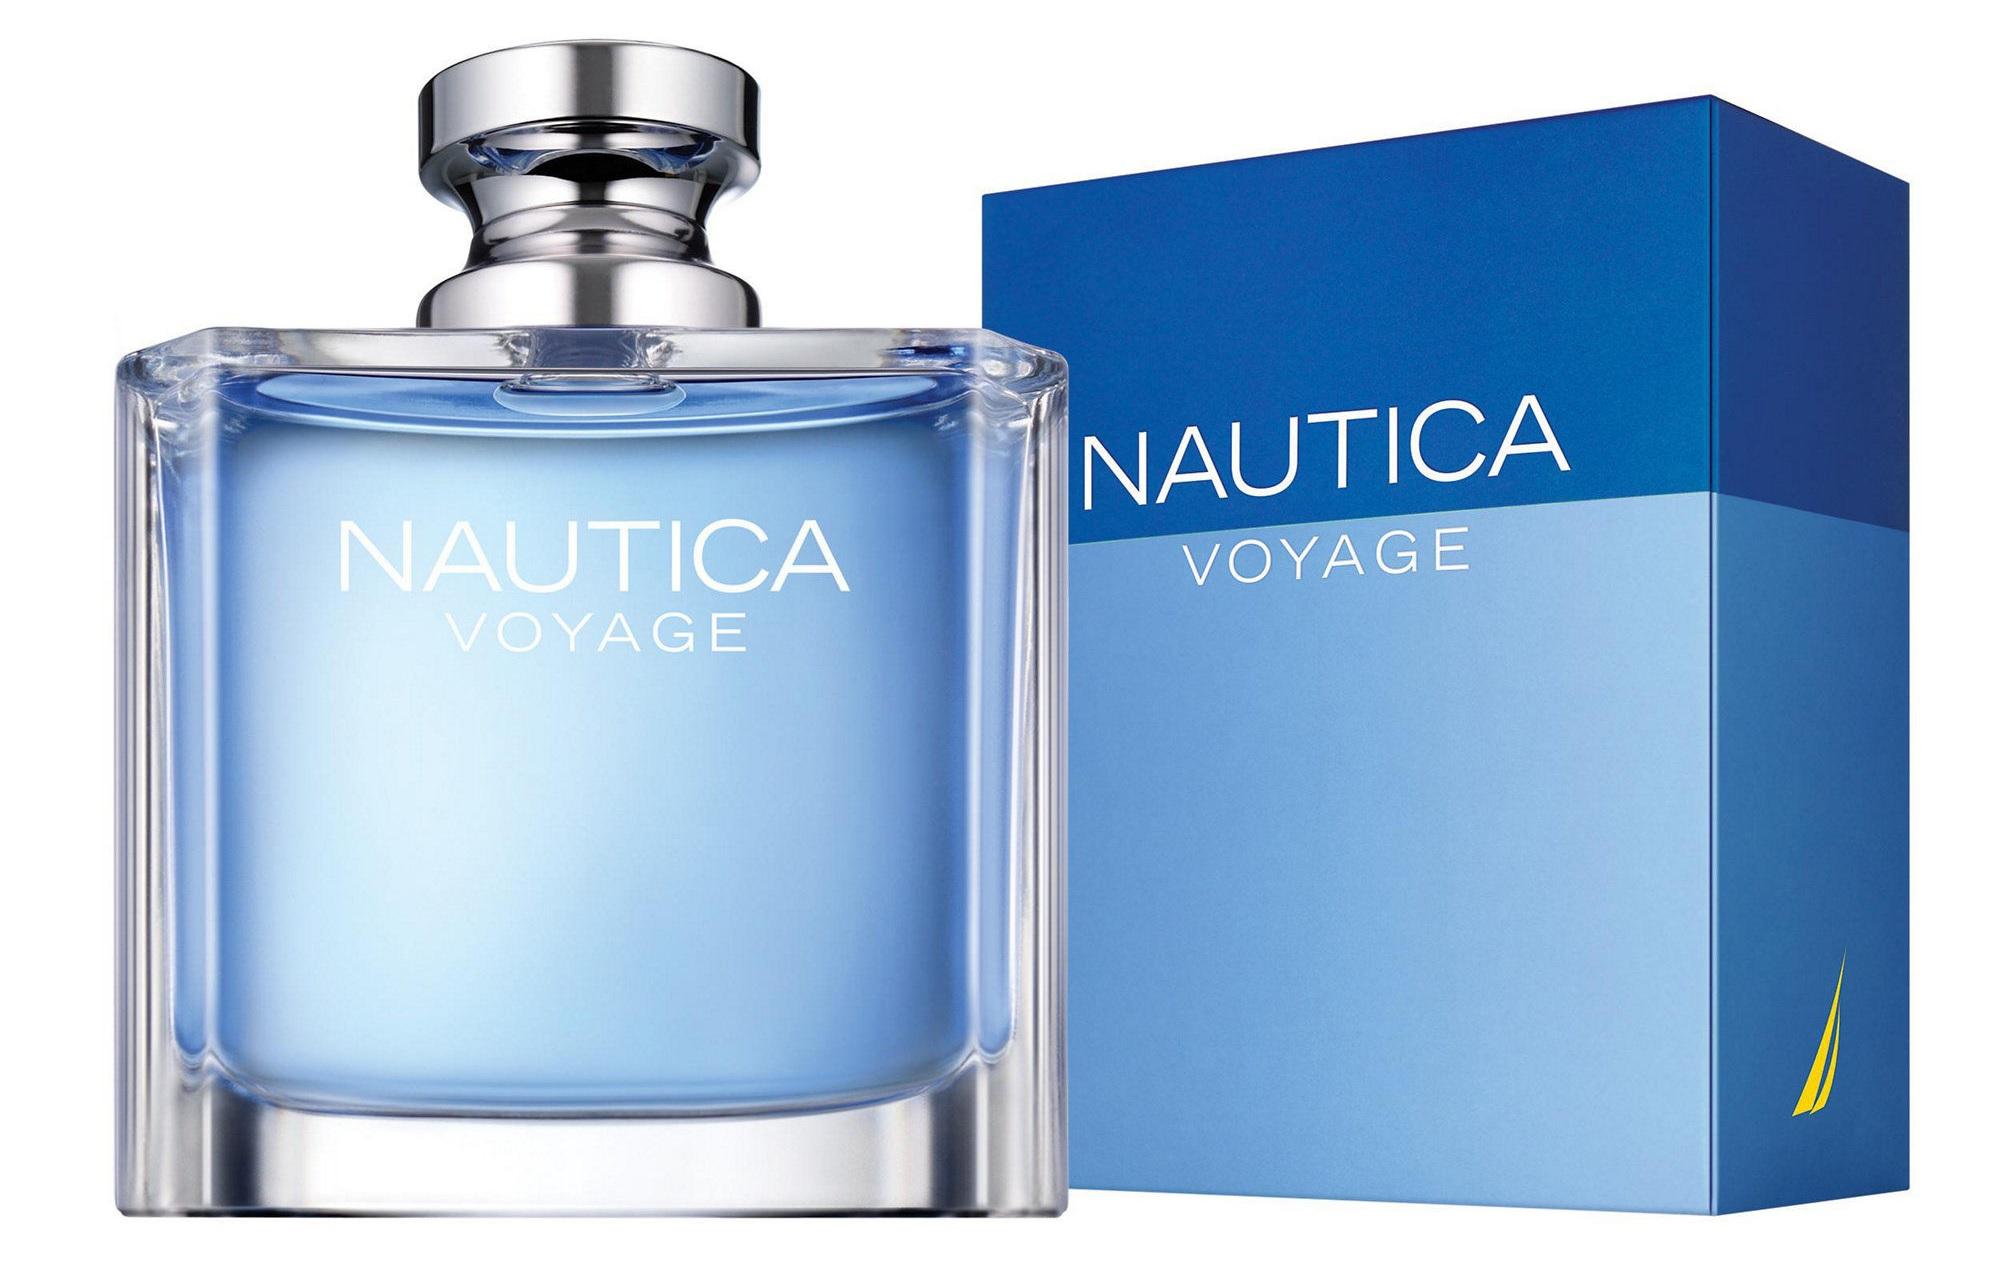 Nautica Voyage 100 mL